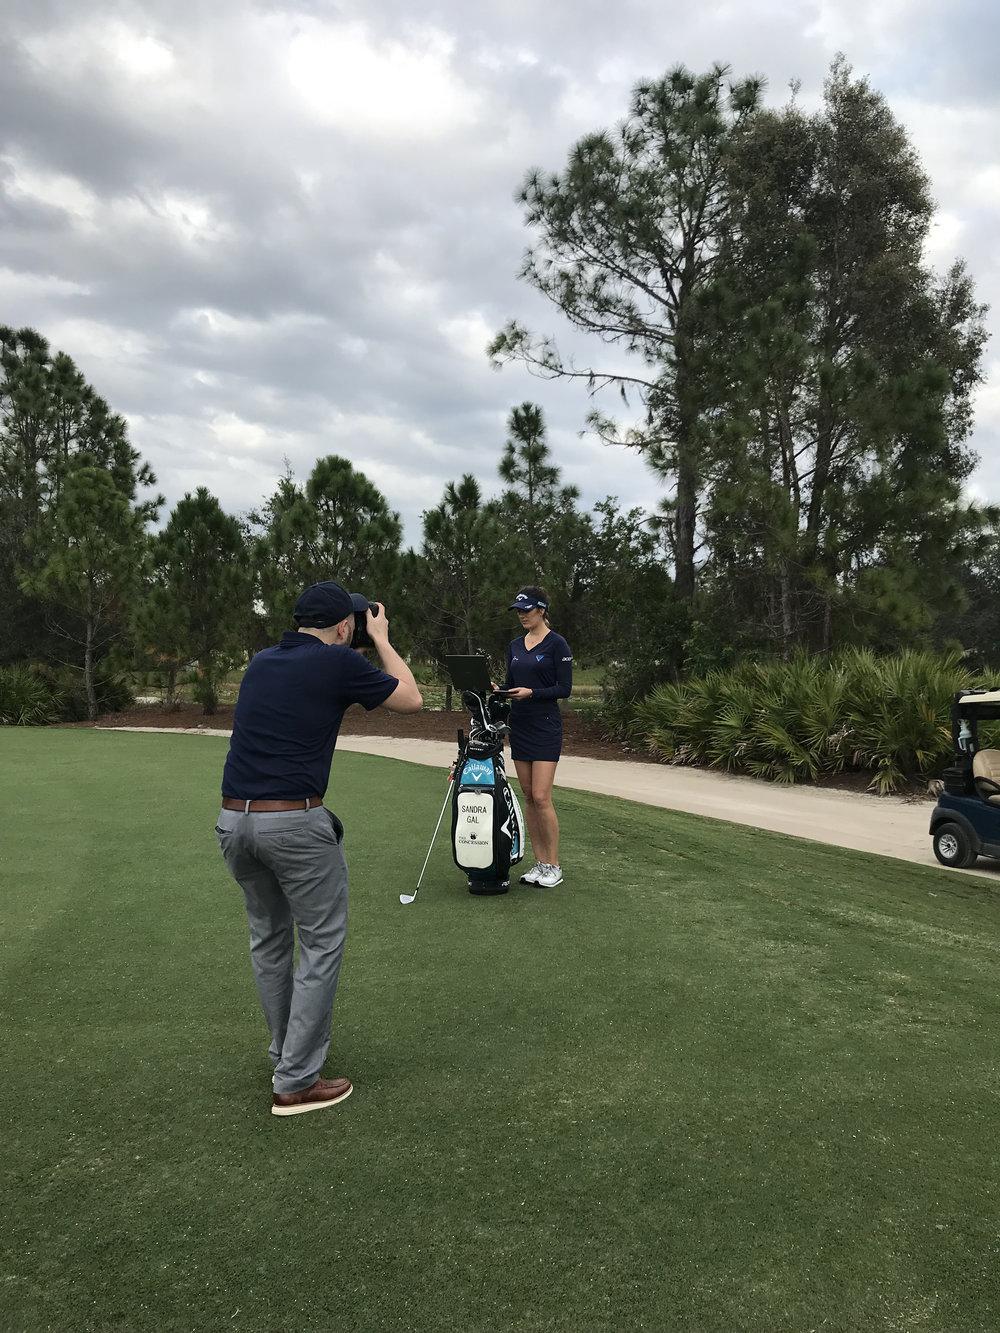 Nick Pecori Tampa Orlando Advertising Commercial Photographer for Acer LPGA Golfer Sandra Gal - 16.JPG